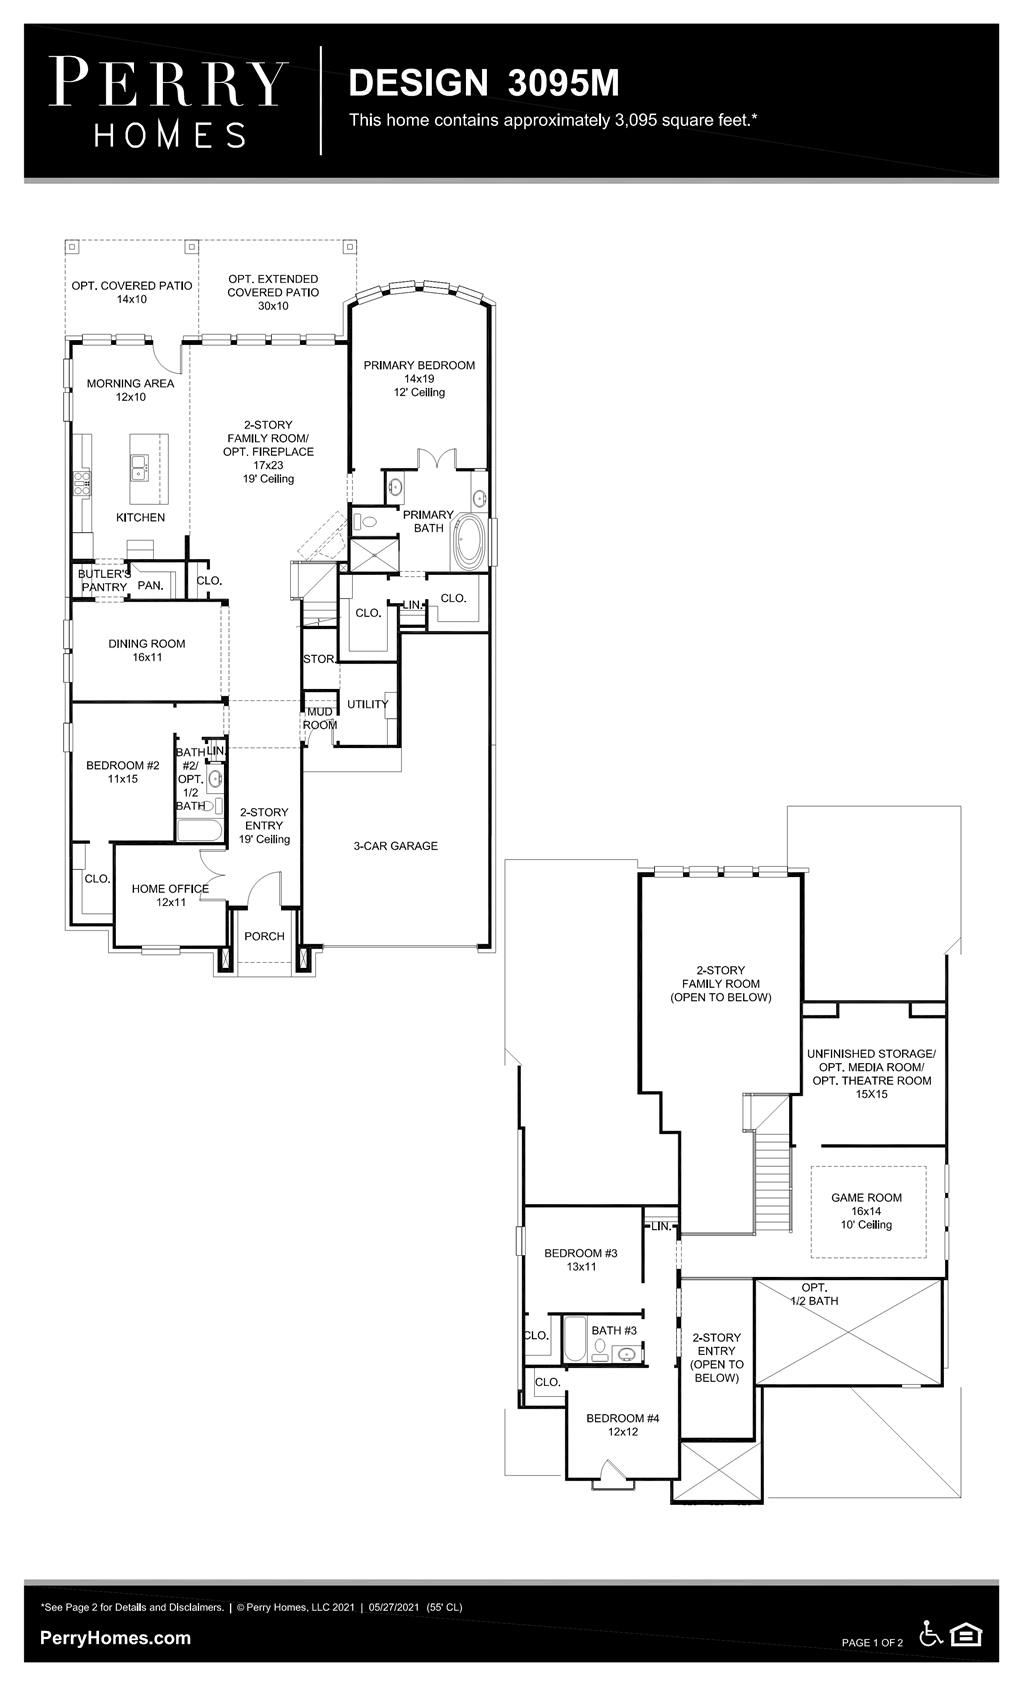 Floor Plan for 3095M